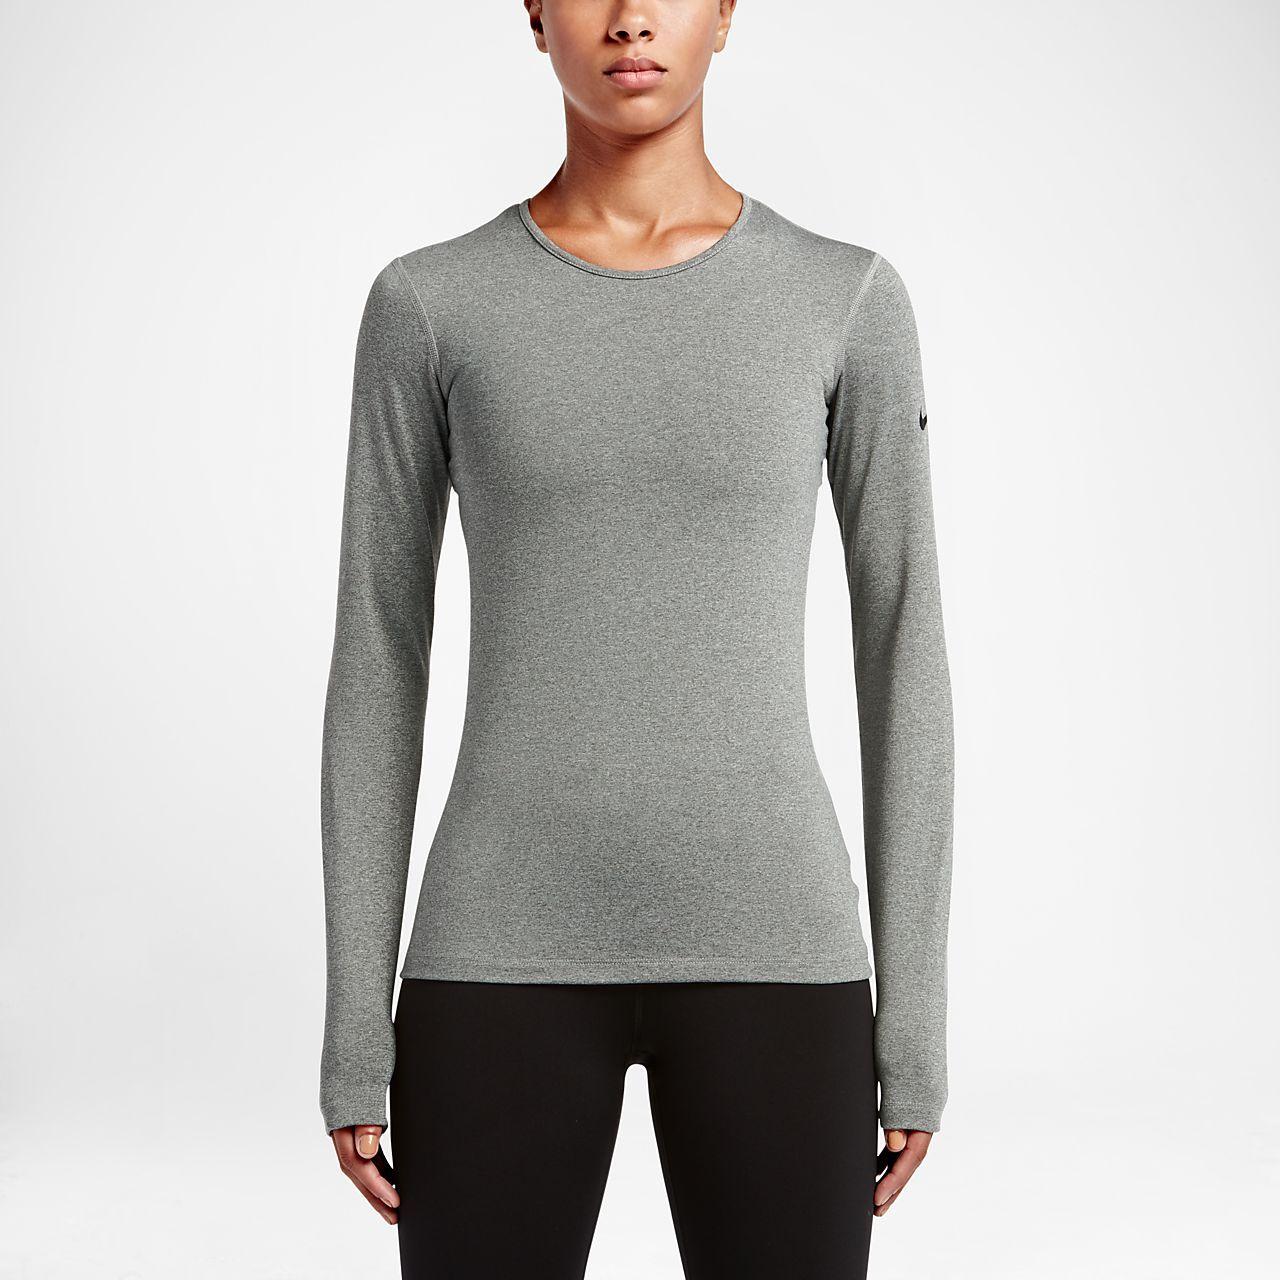 Nike Pro Warm Women's Long Sleeve Training Tops Dark Grey Heather/Black